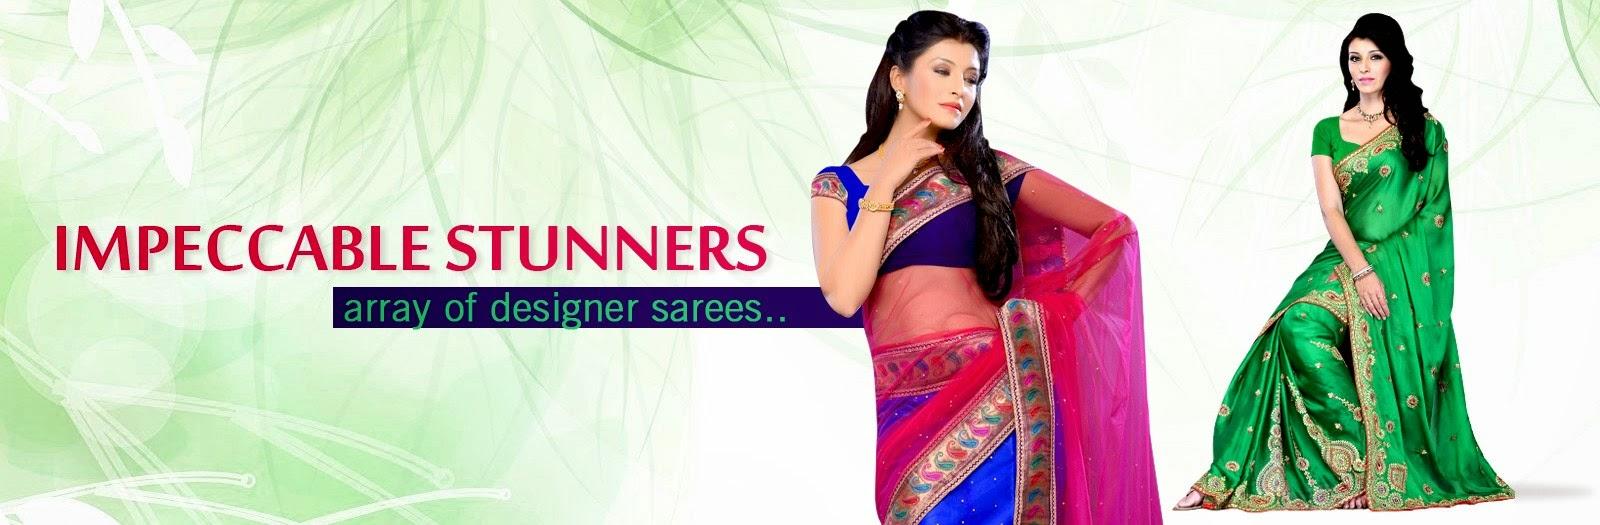 bollywood sarees india